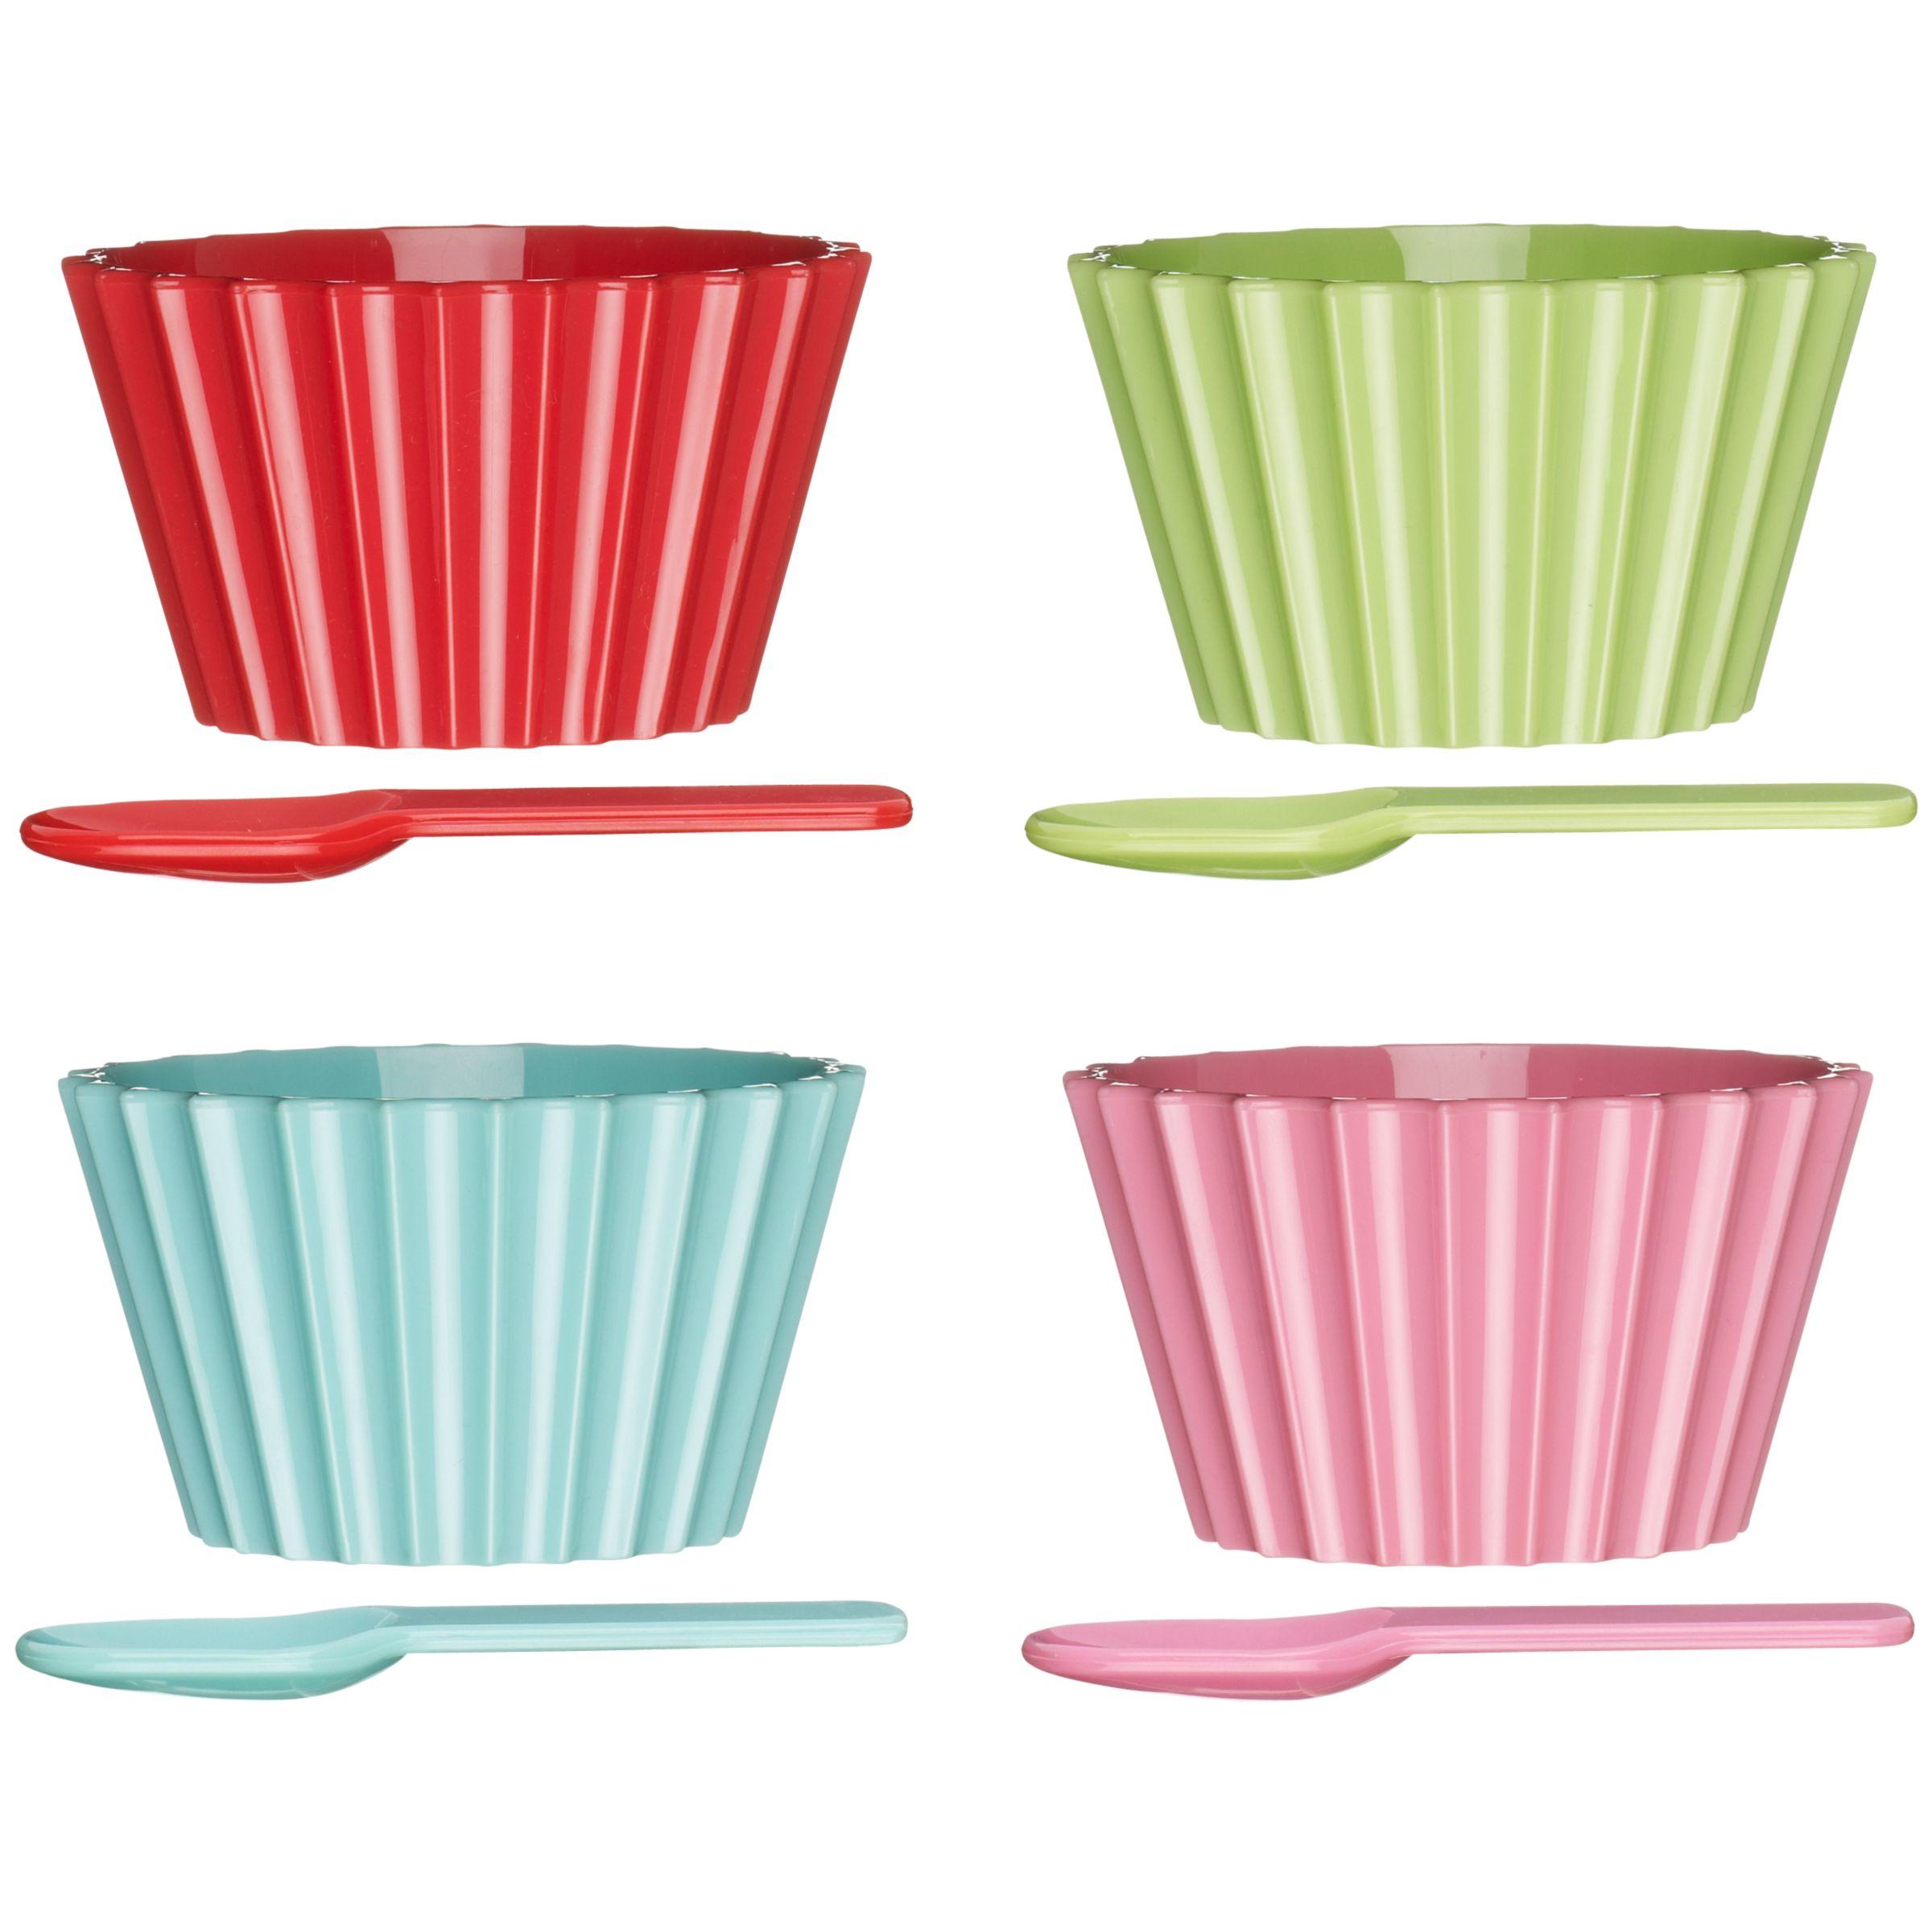 John Lewis Brights Picnic Ice Cream Bowls, Set of 4